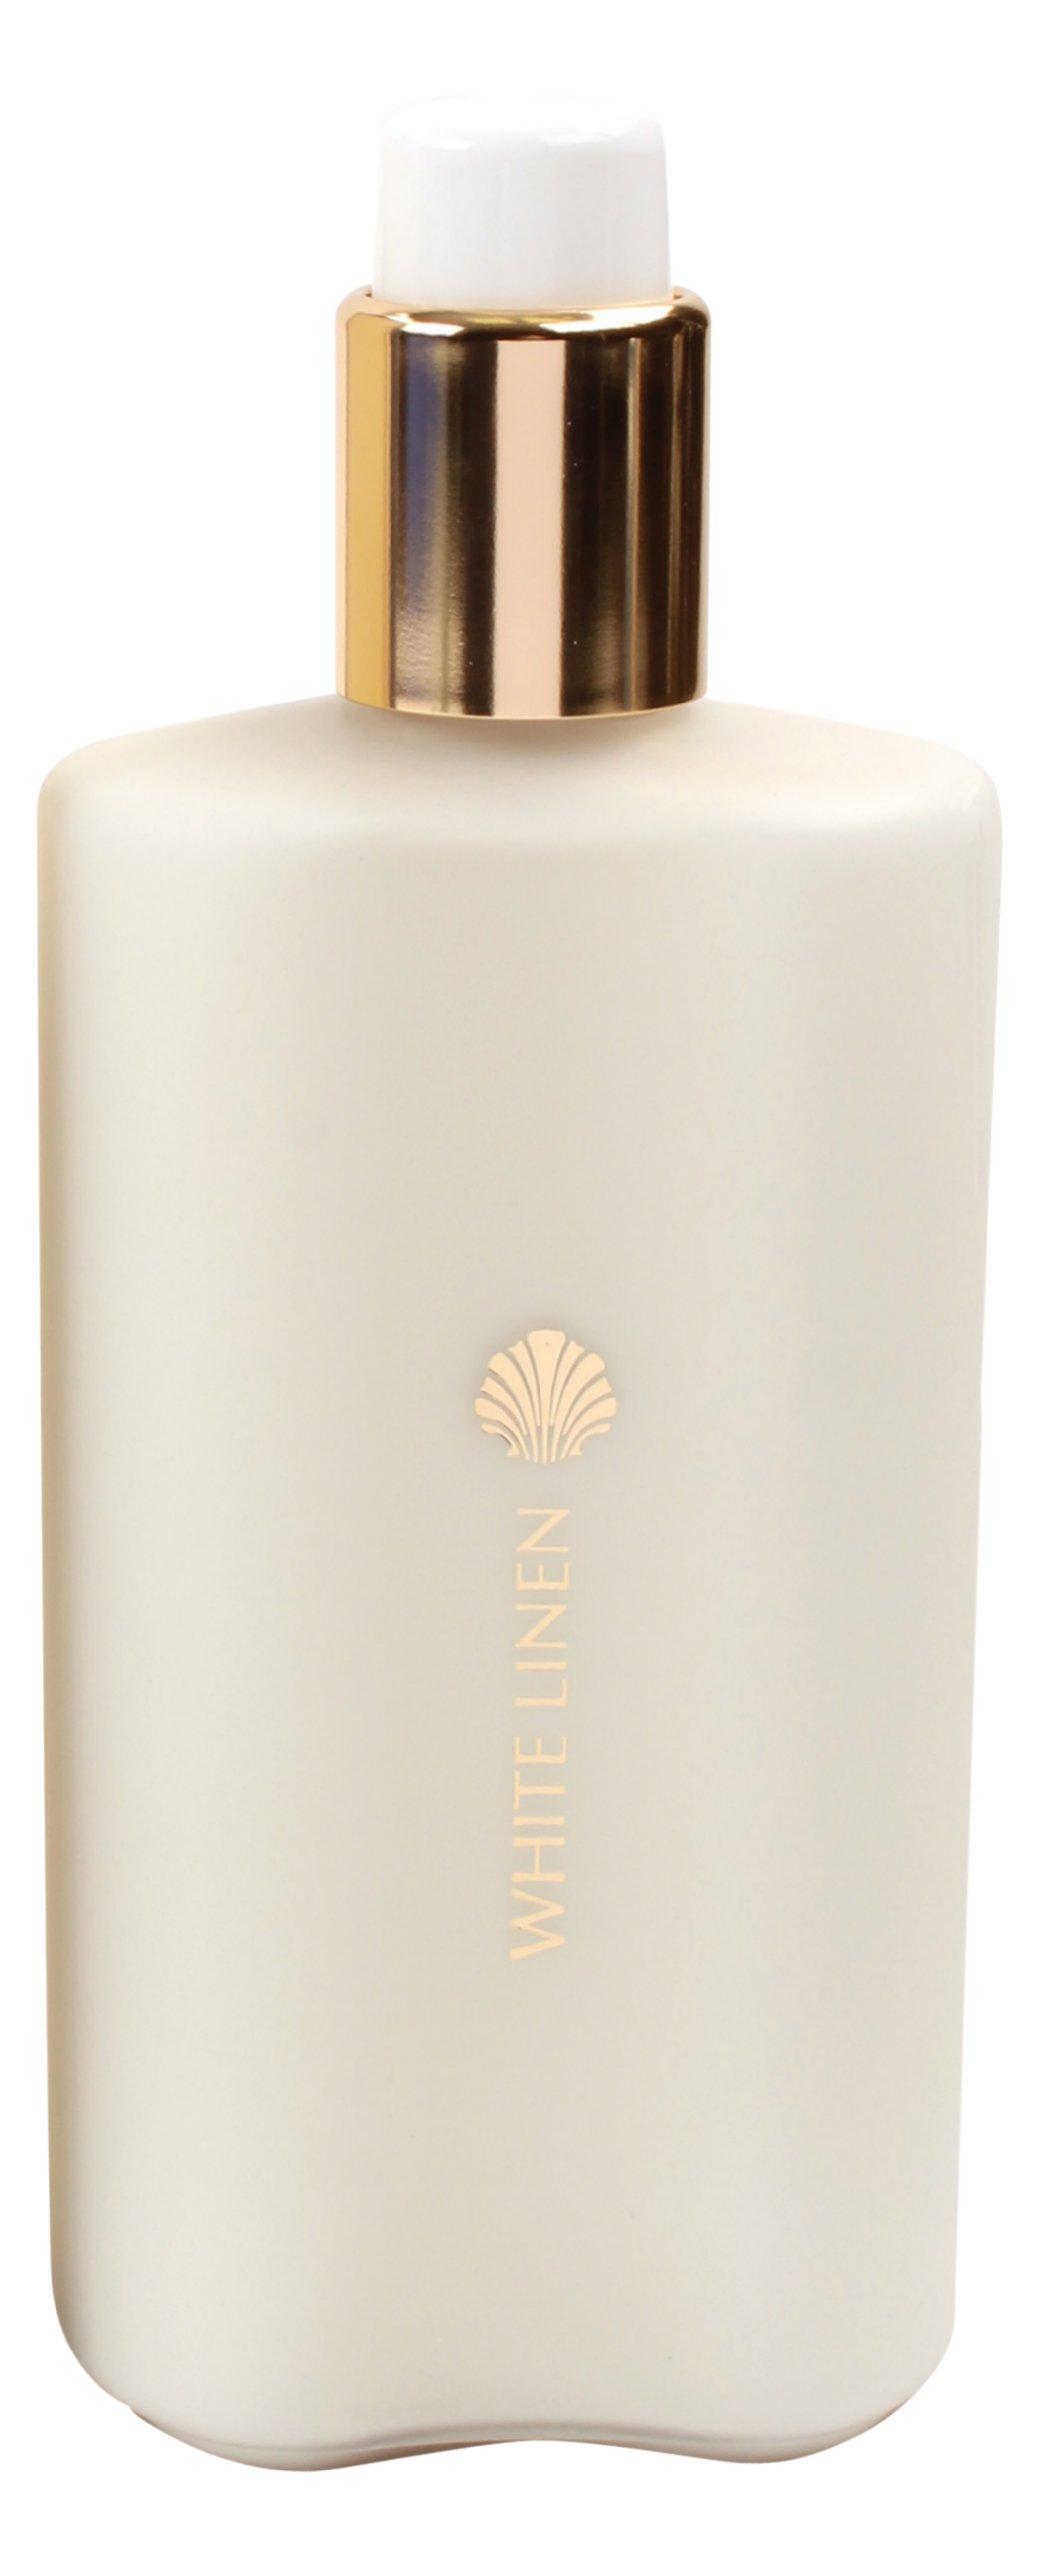 Estee Lauder White Linen Perfumed Body Lotion 8.4 Ounce